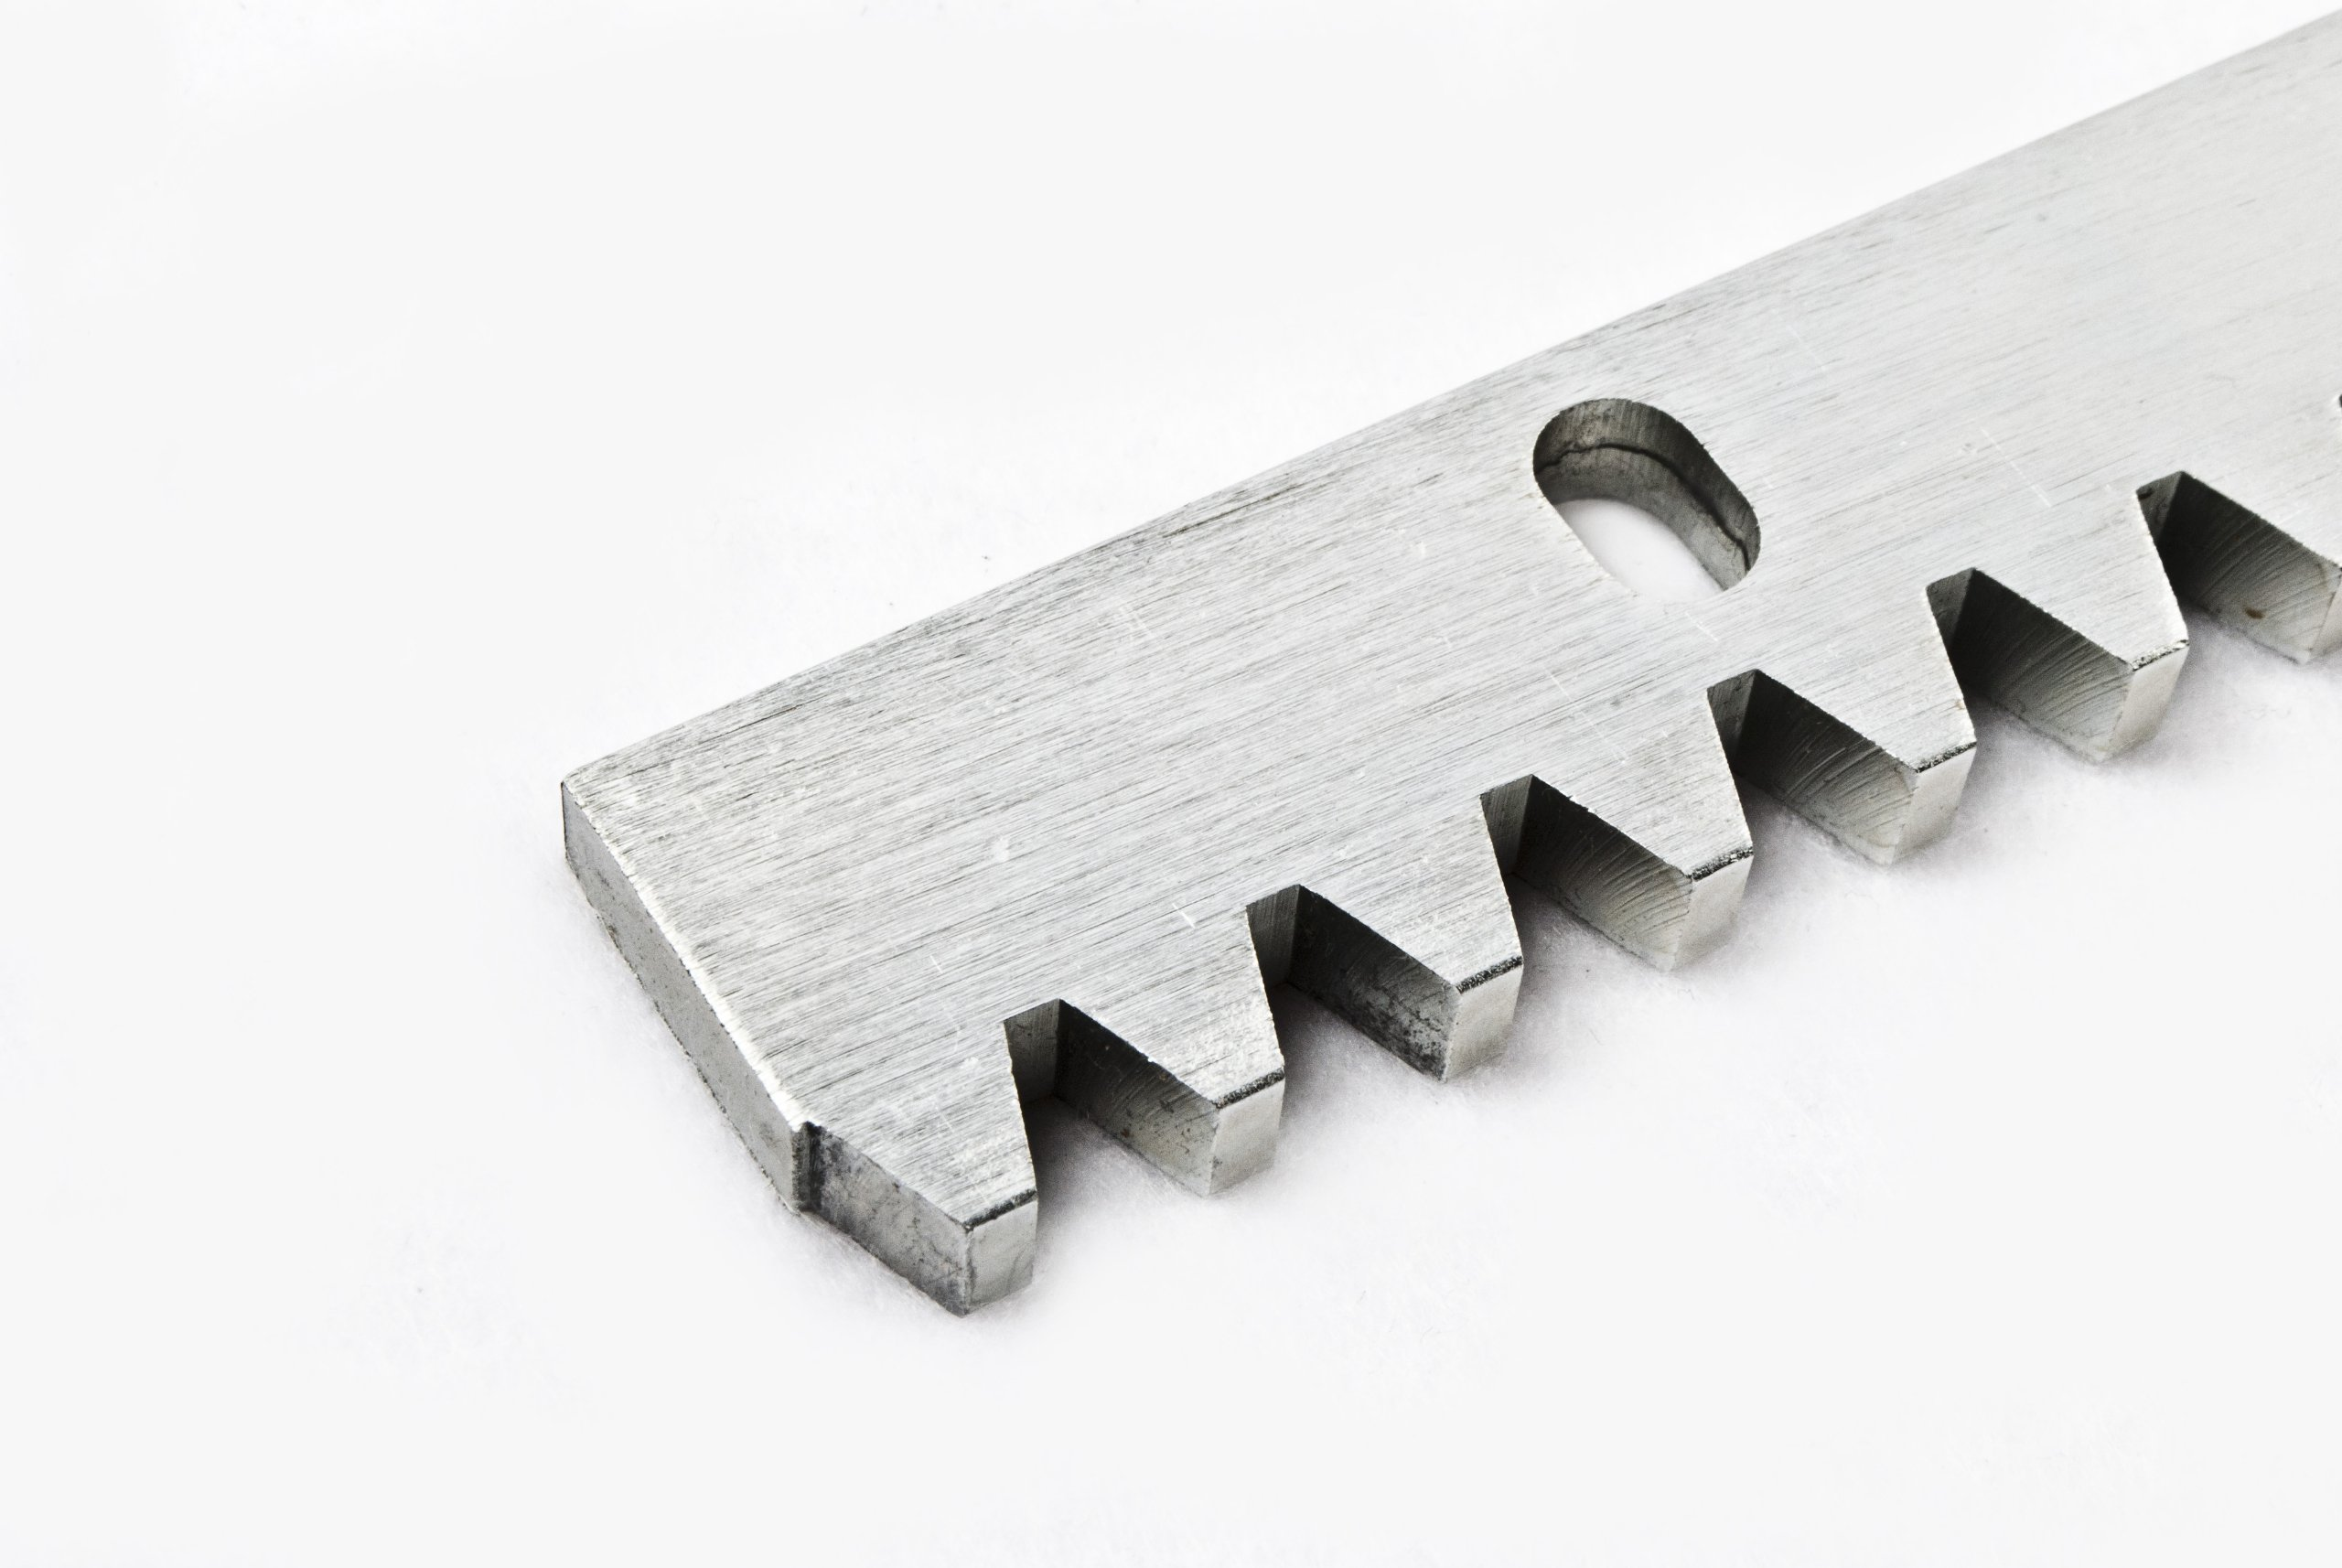 ALEKO 4MGRACK33 Steel Gear Racks for Sliding Gate Opener Operator Set of 4 3.3 Foot Racks Total 13 Feet